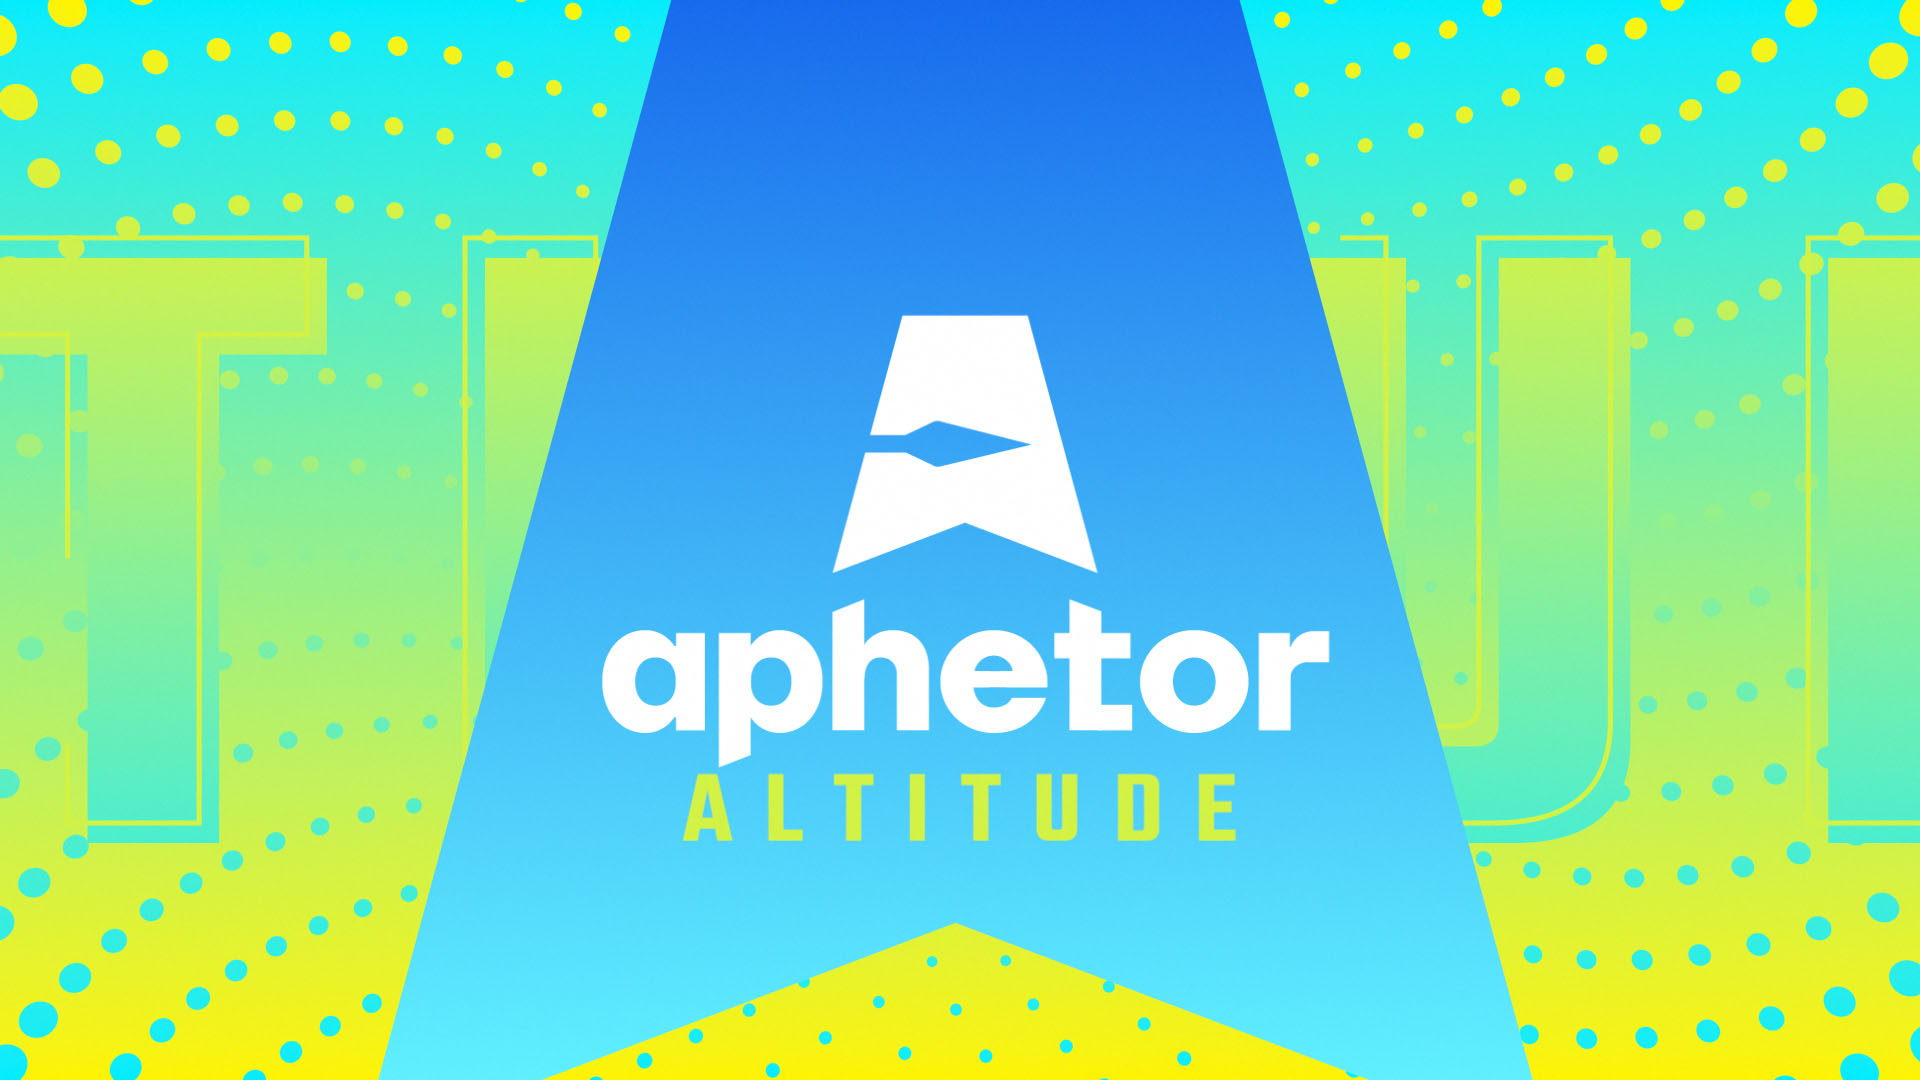 Aphetor Altitude